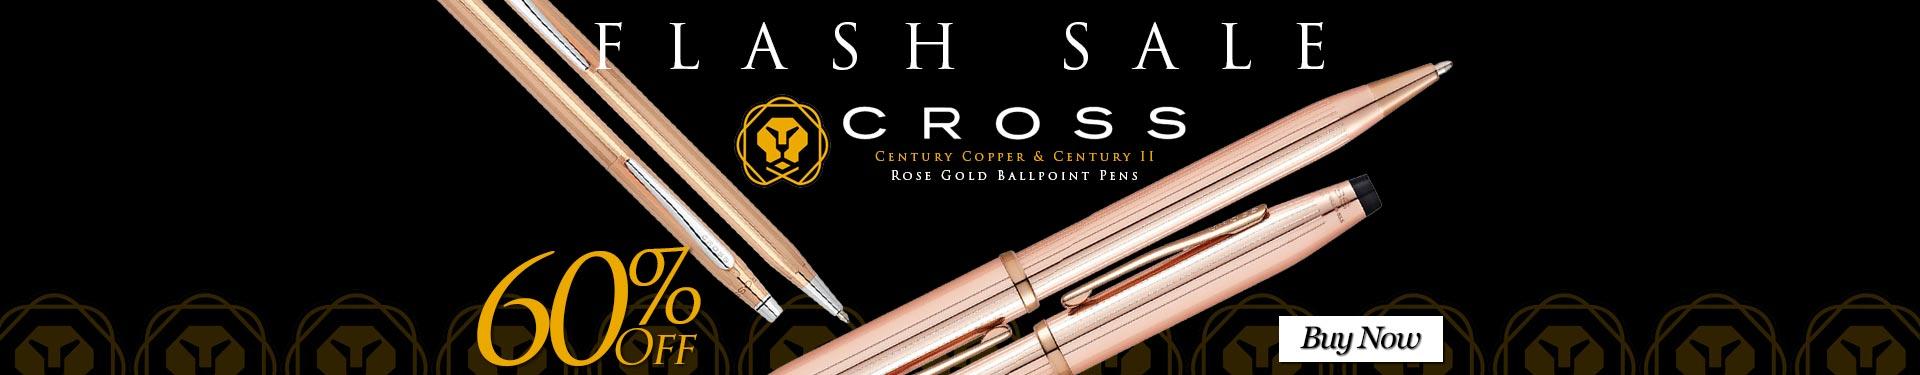 Save 60% on Cross Century Copper & Century II Rose Gold Ballpoint Pens